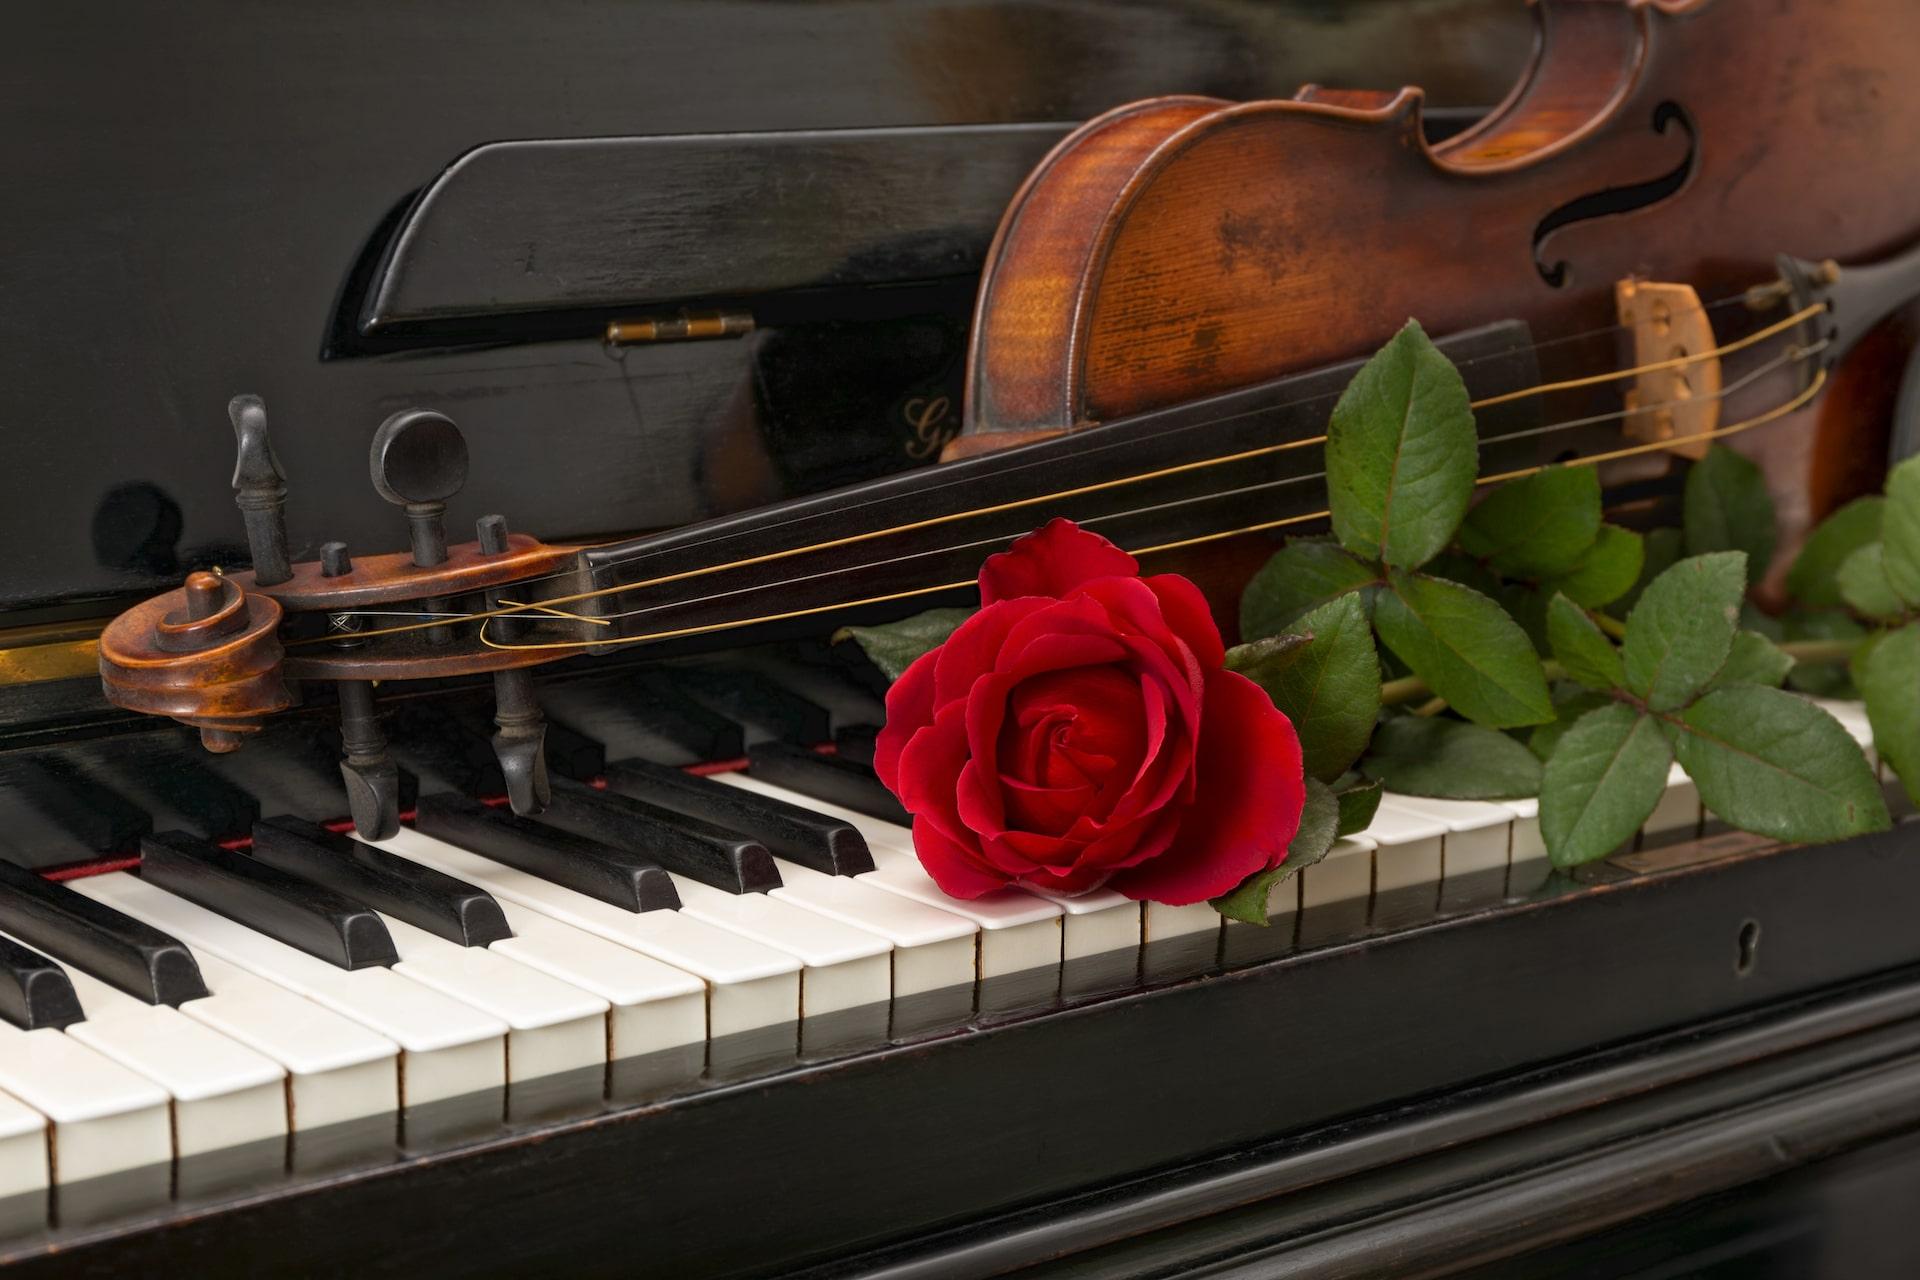 Your Song (Elton John) – Klaviernoten, Leadsheet und Anleitung